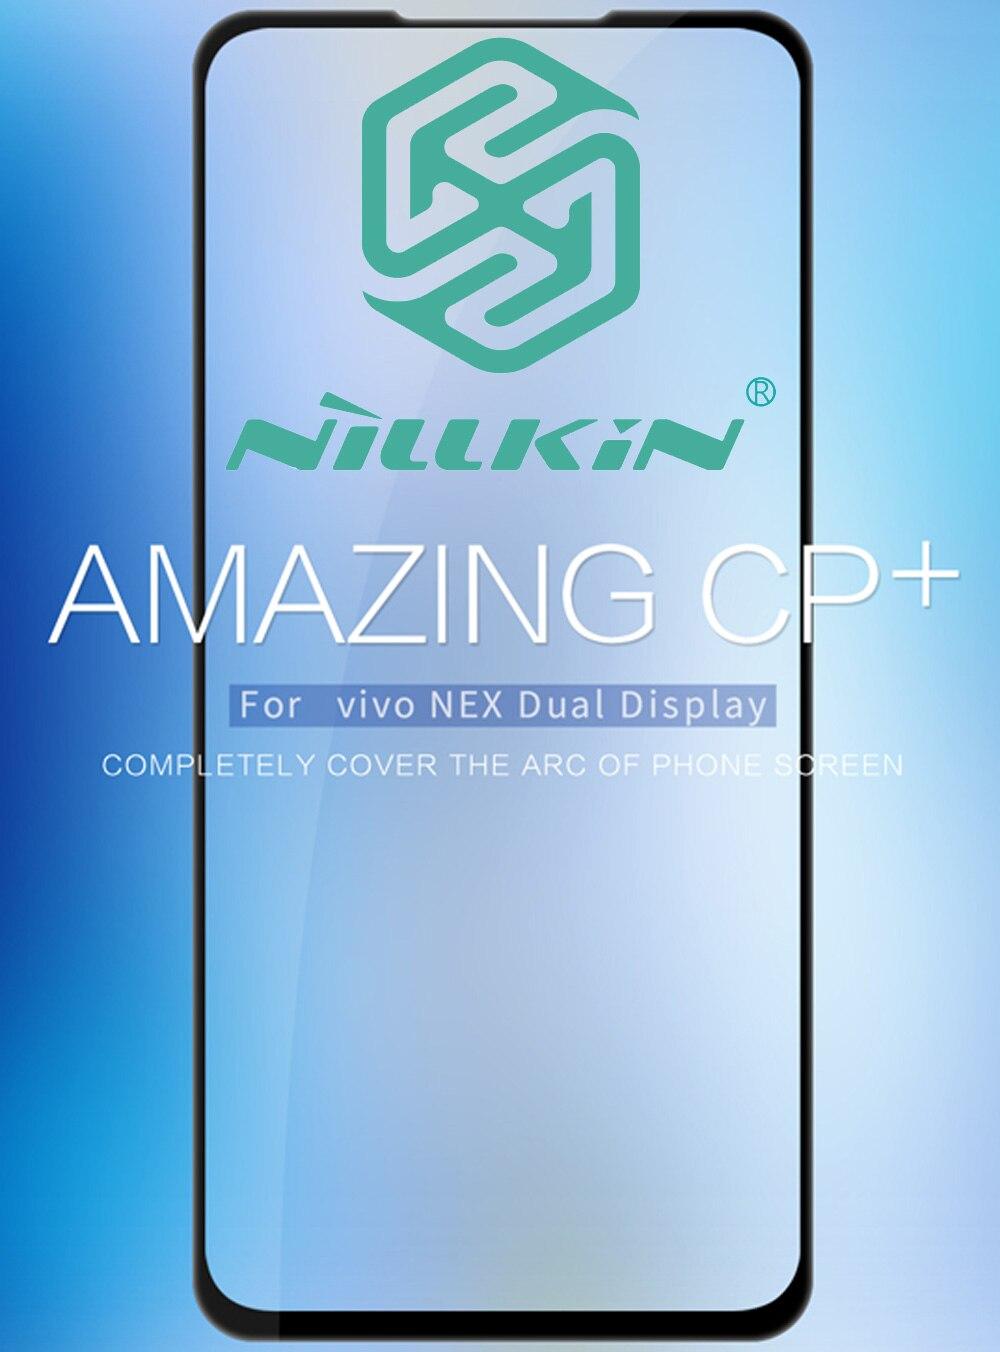 Nillkin CP + vidrio templado para vivo la próxima pantalla Dual 1813 funda protectora oleophobic de panel completo de pegamento